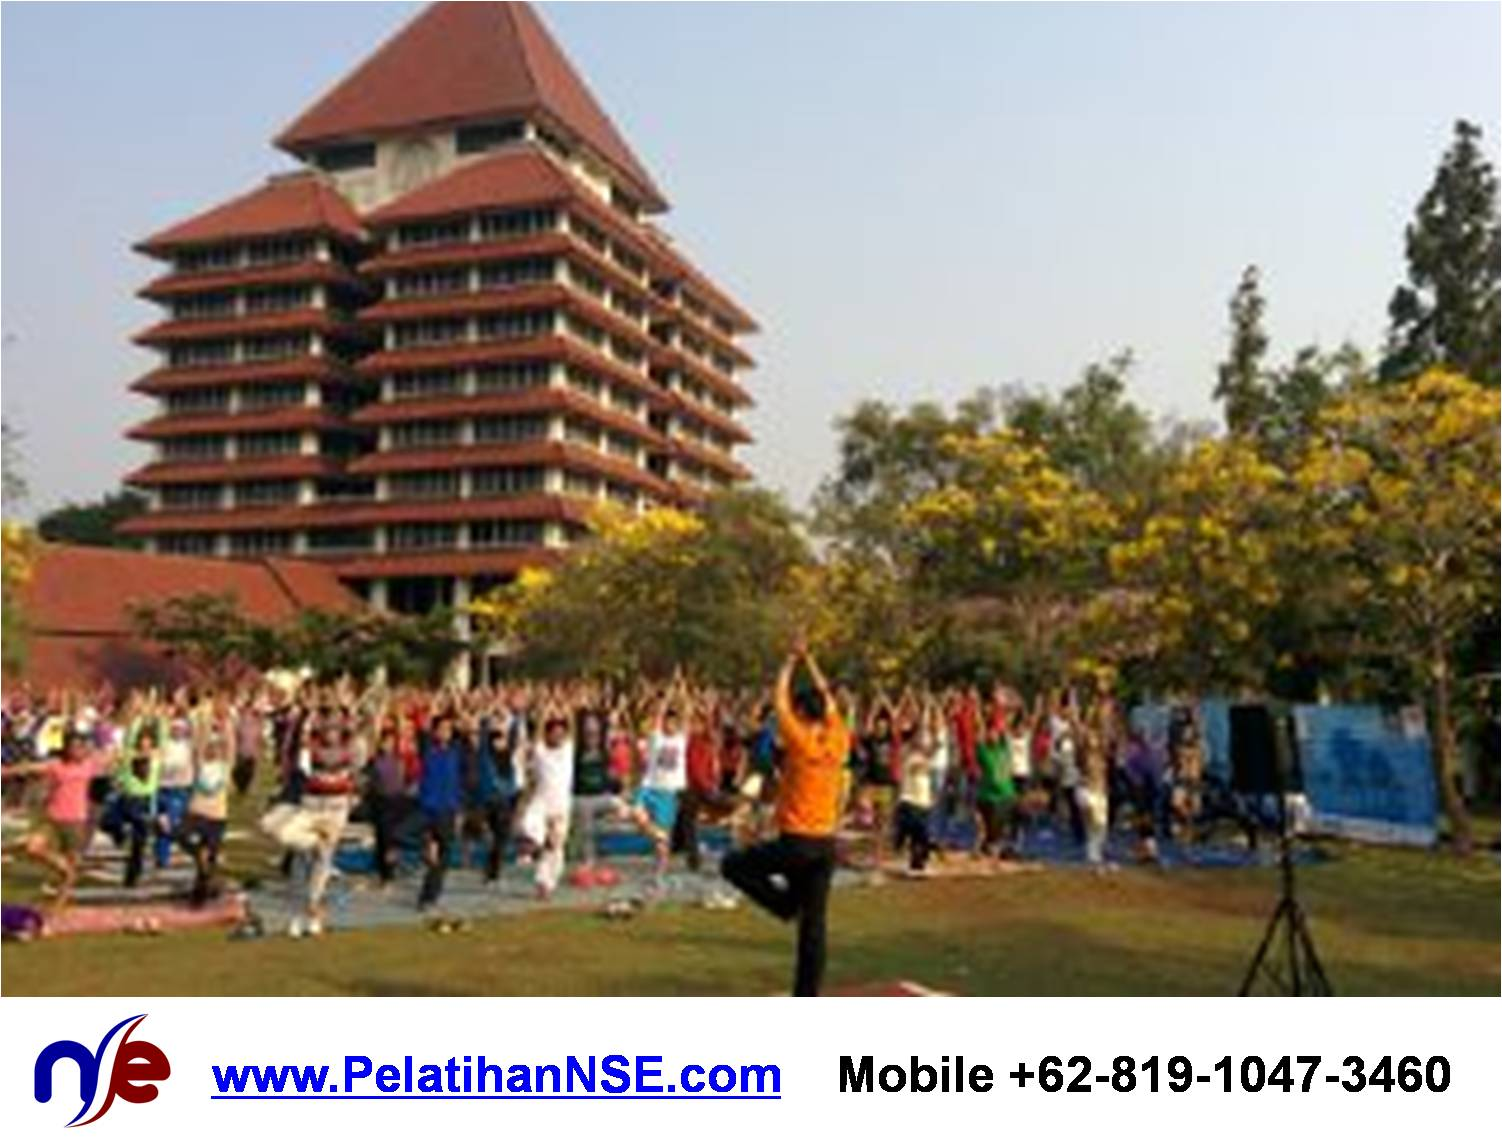 Project - KMHD UI - Yoga for Life - Postur Vriksasana bersama 250an peserta